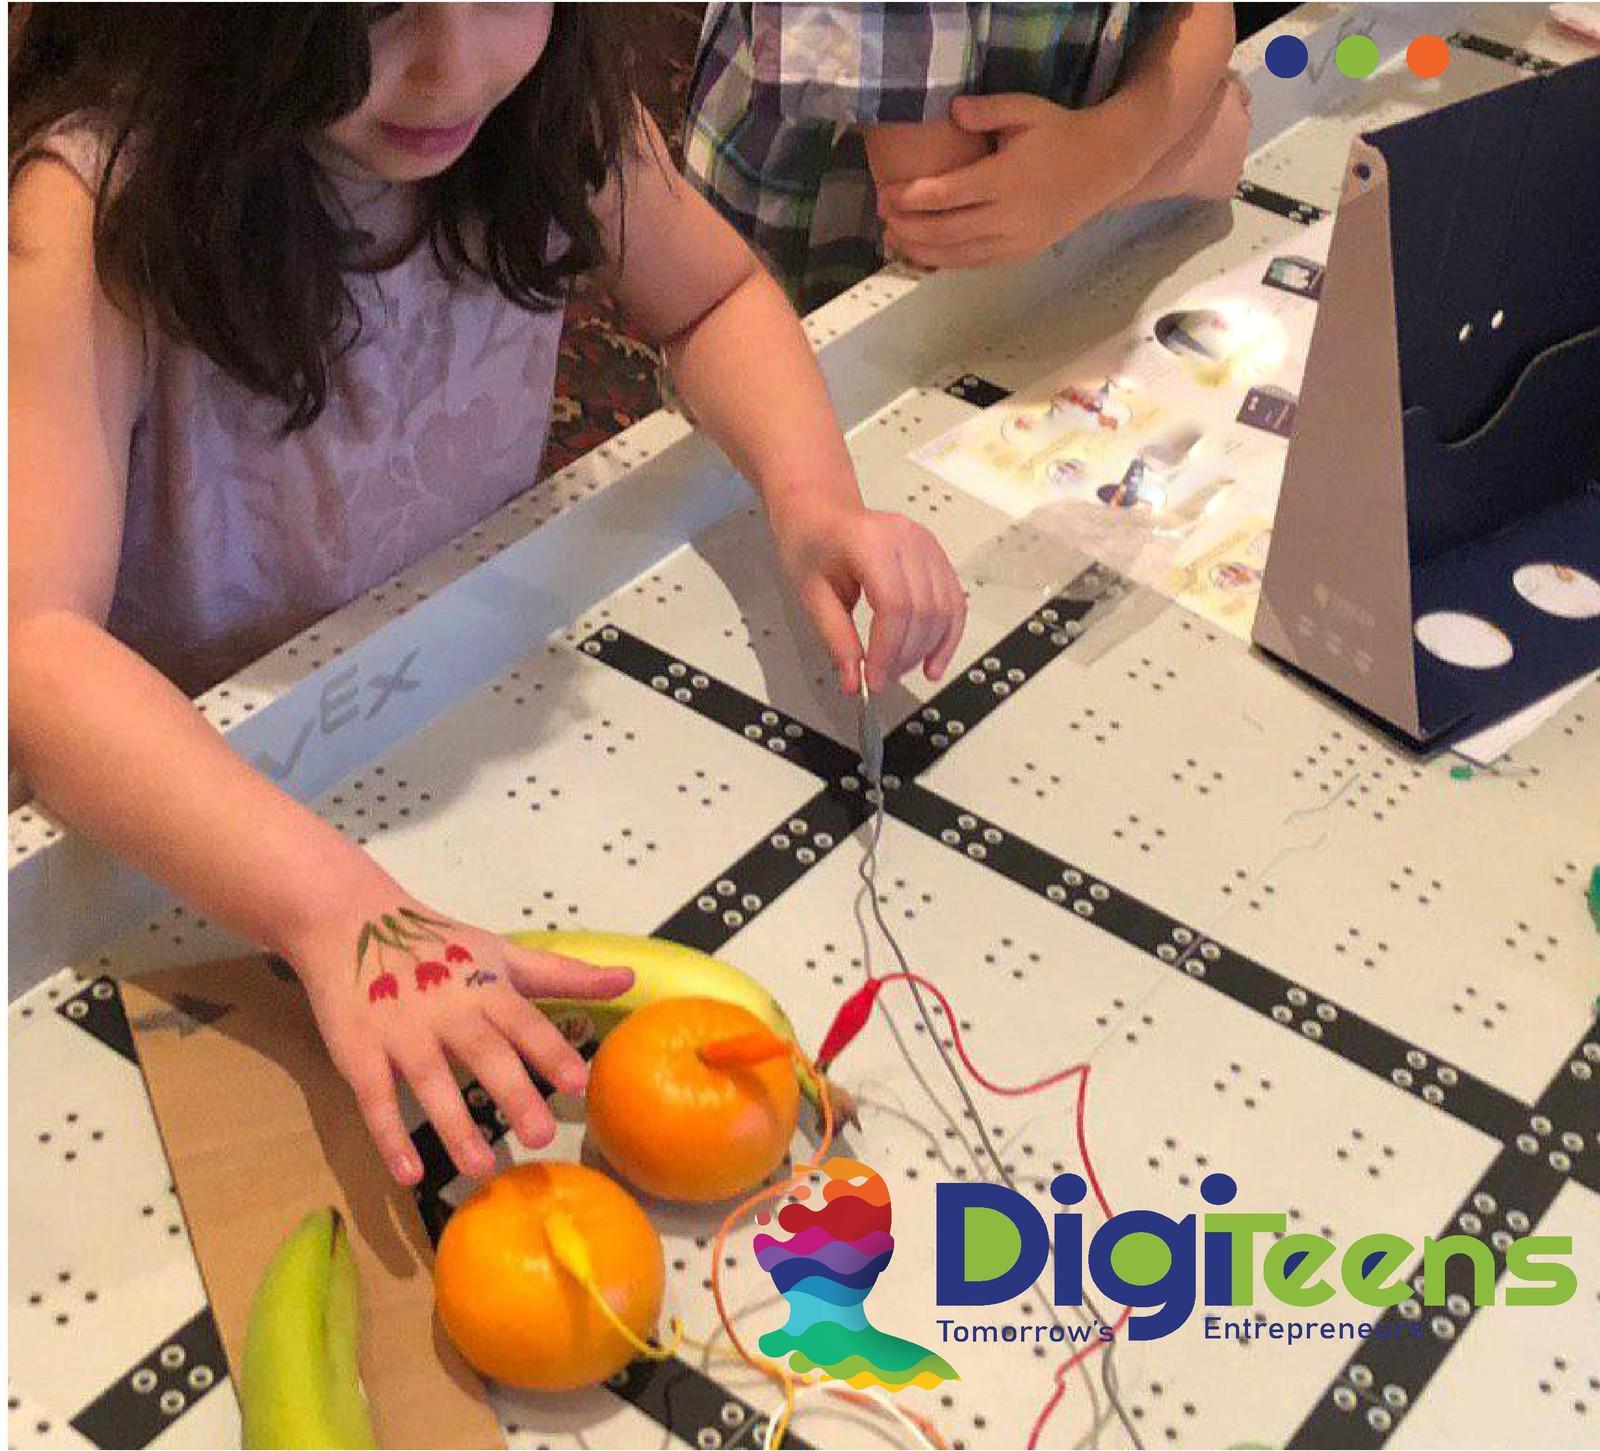 Stem Programs For Teens: Robotics, STEM And AI Camps For Kids/teens